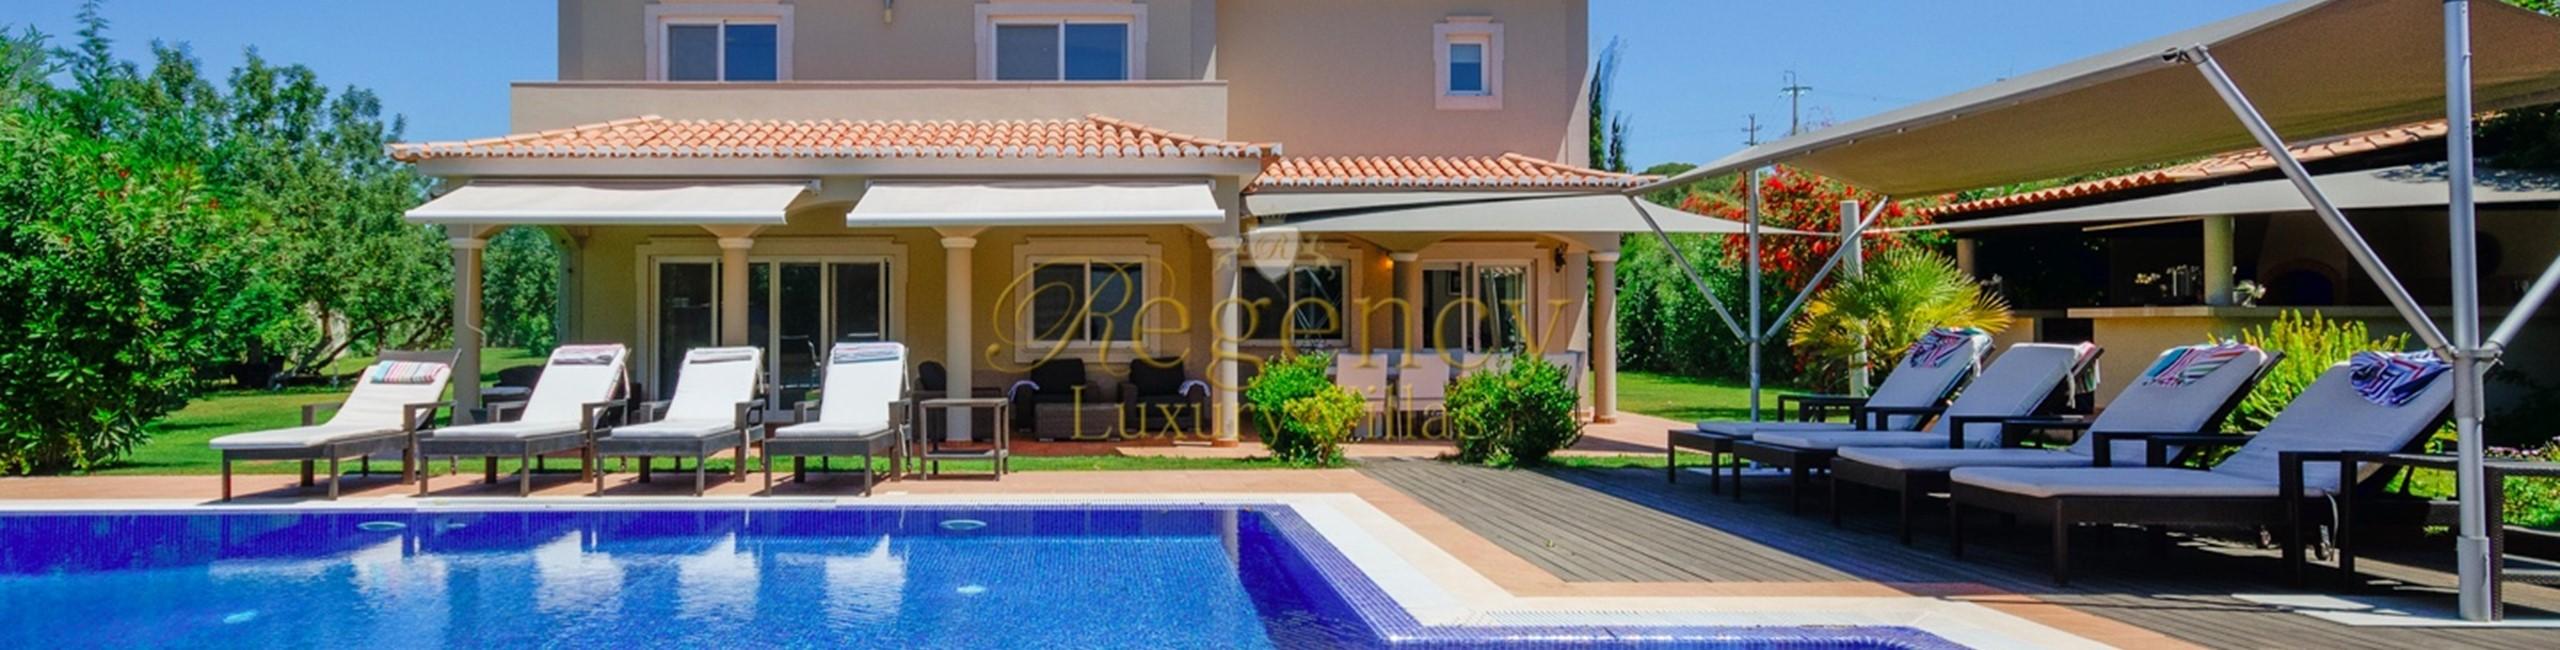 Villa To Rent In Vilamoura 79